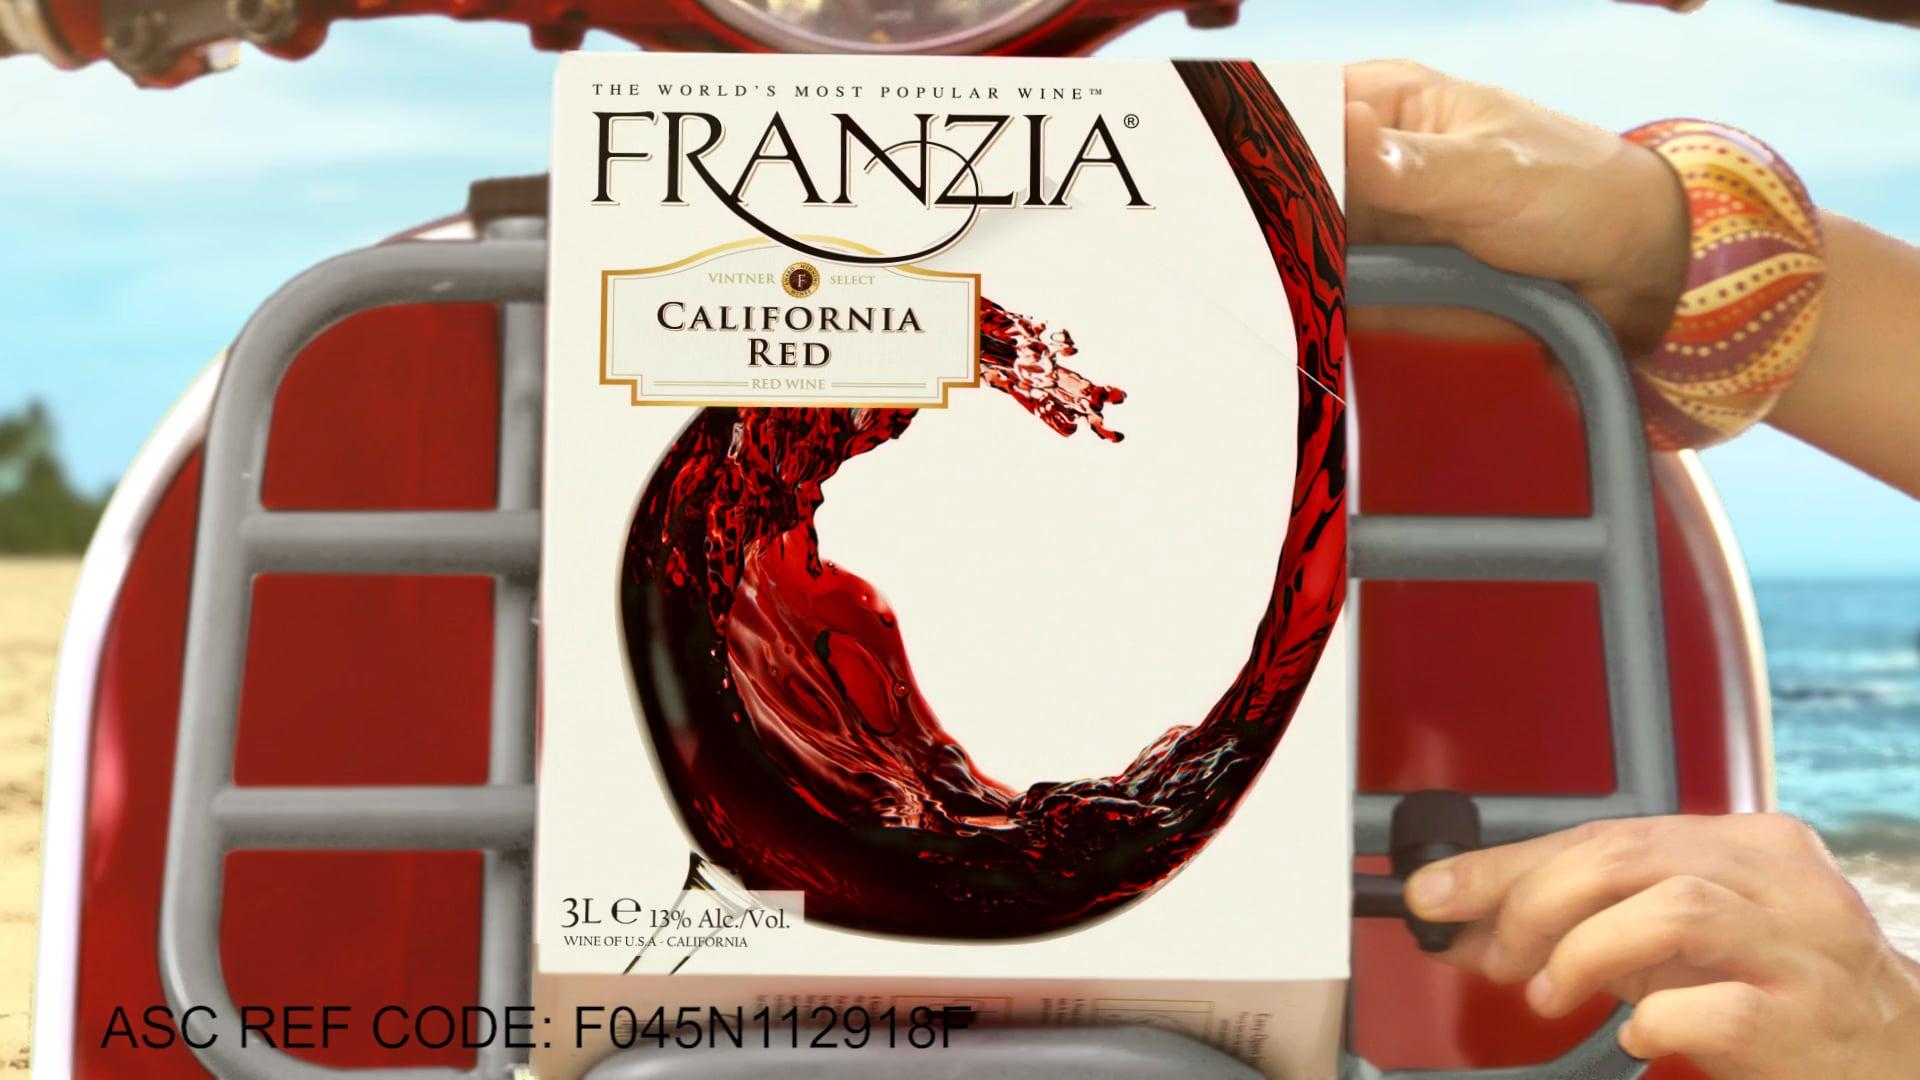 Franzia - California Red